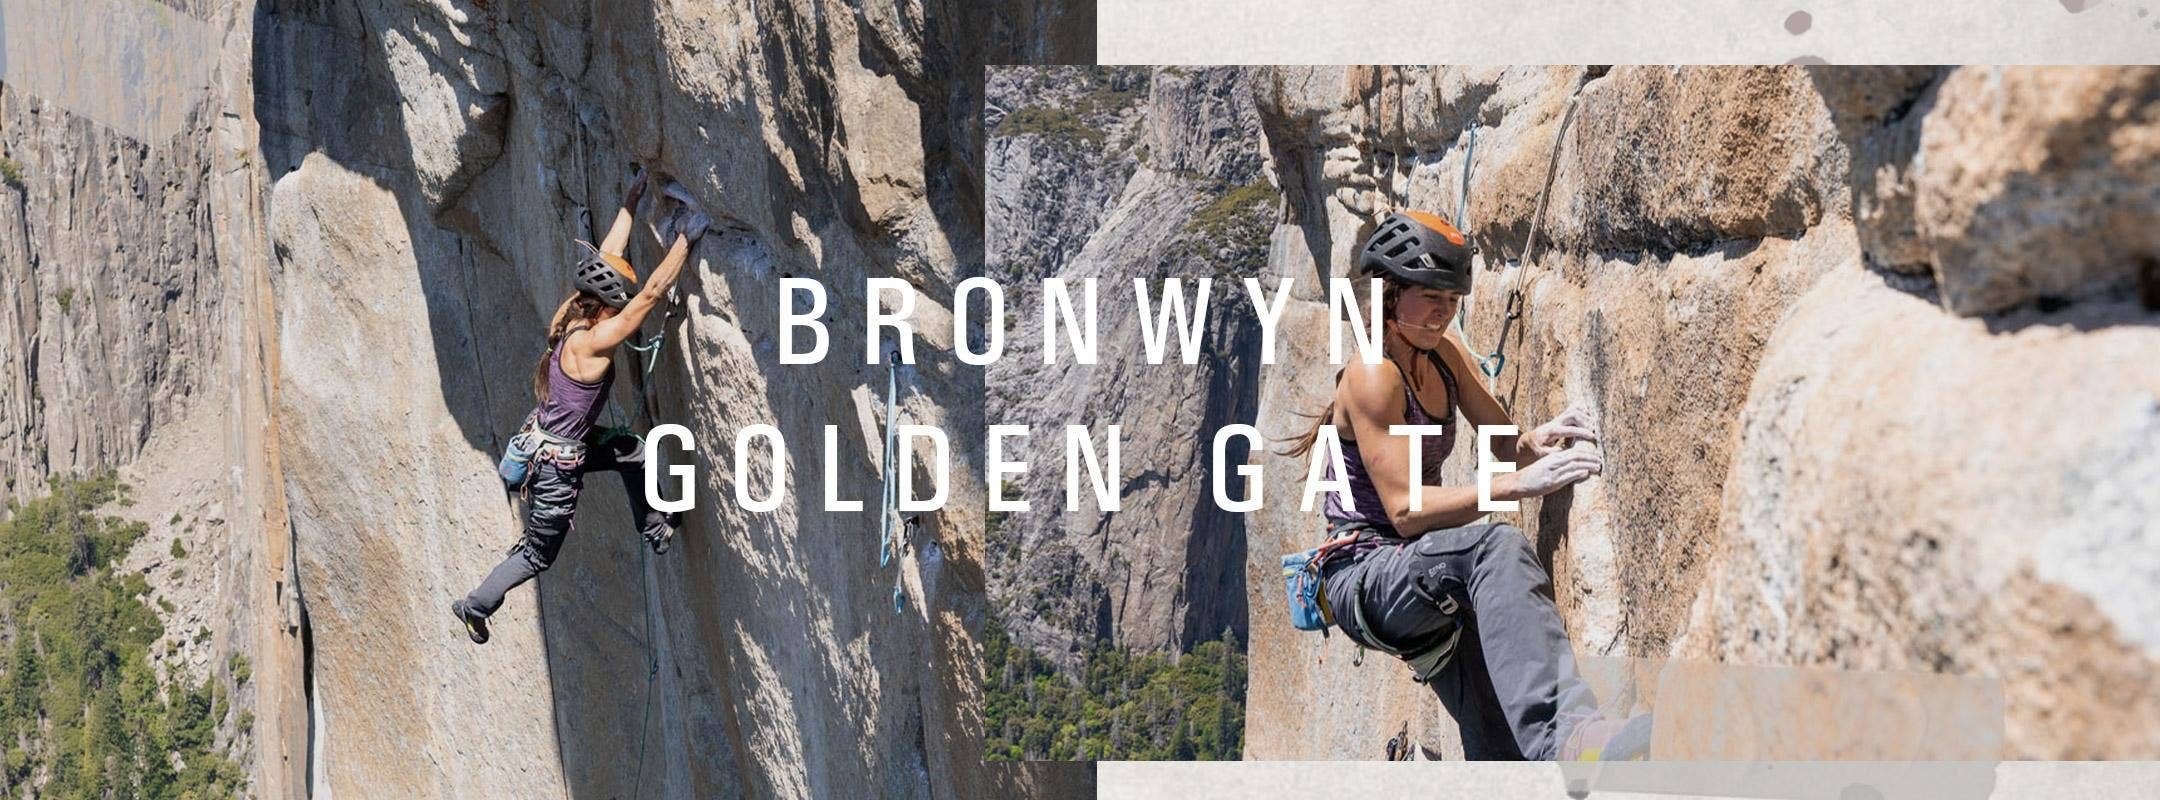 Bronwyn Golden Gate - Part 1